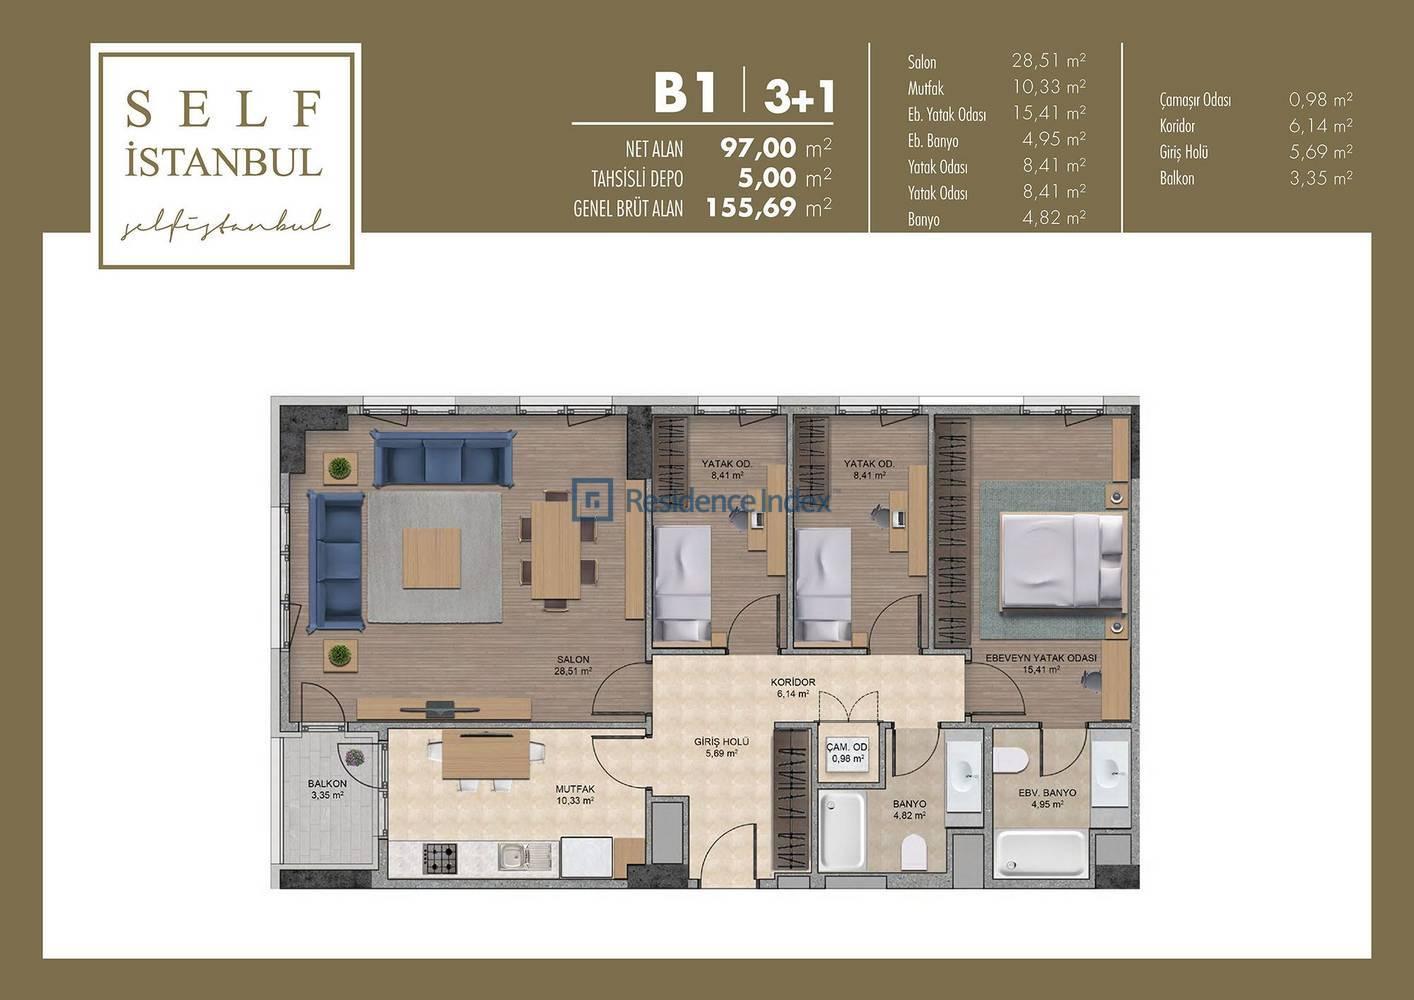 Self İstanbul  B1